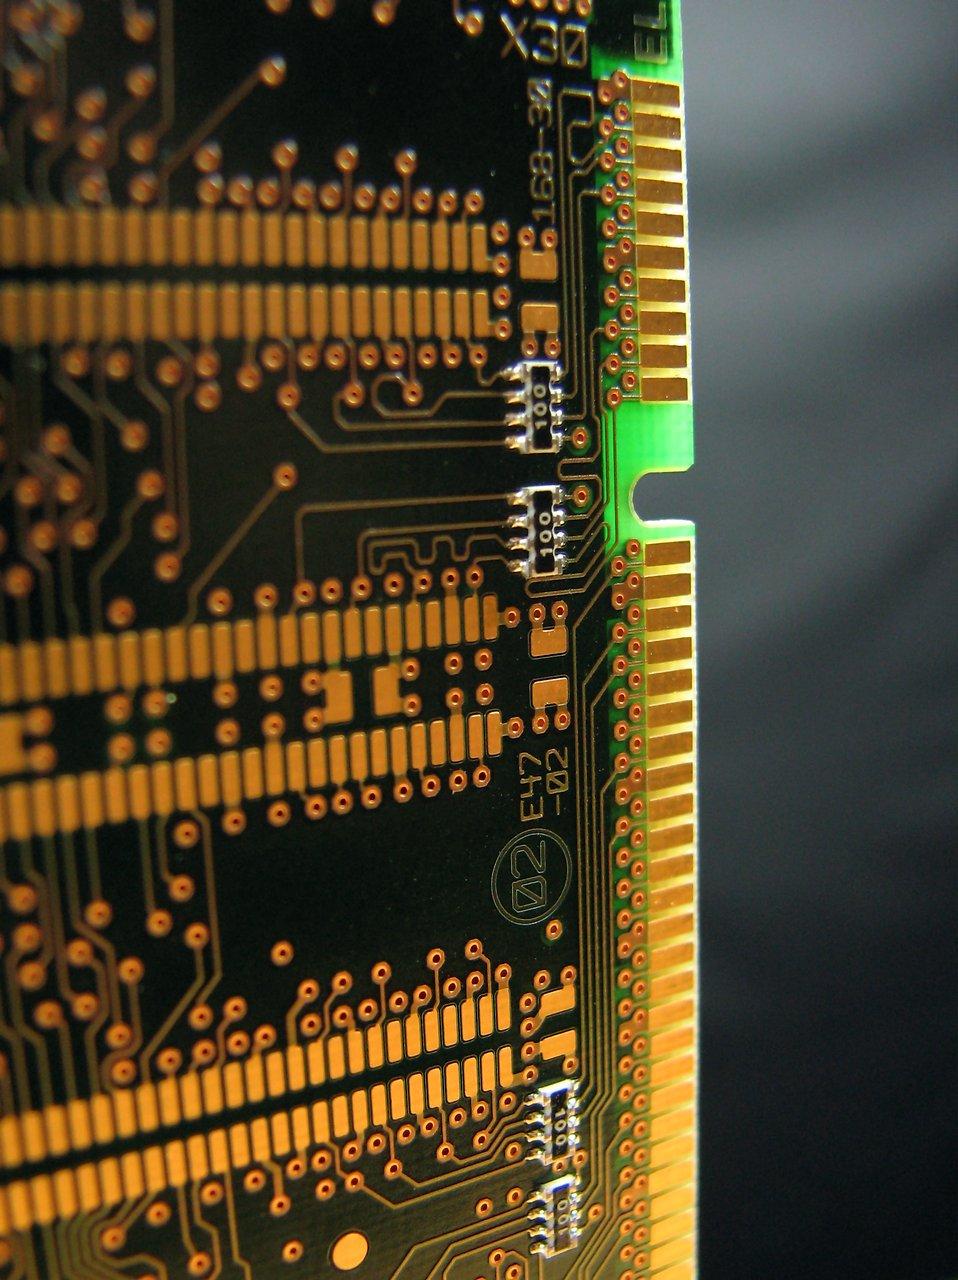 Closeup of a computer memory card : Free Stock Photo